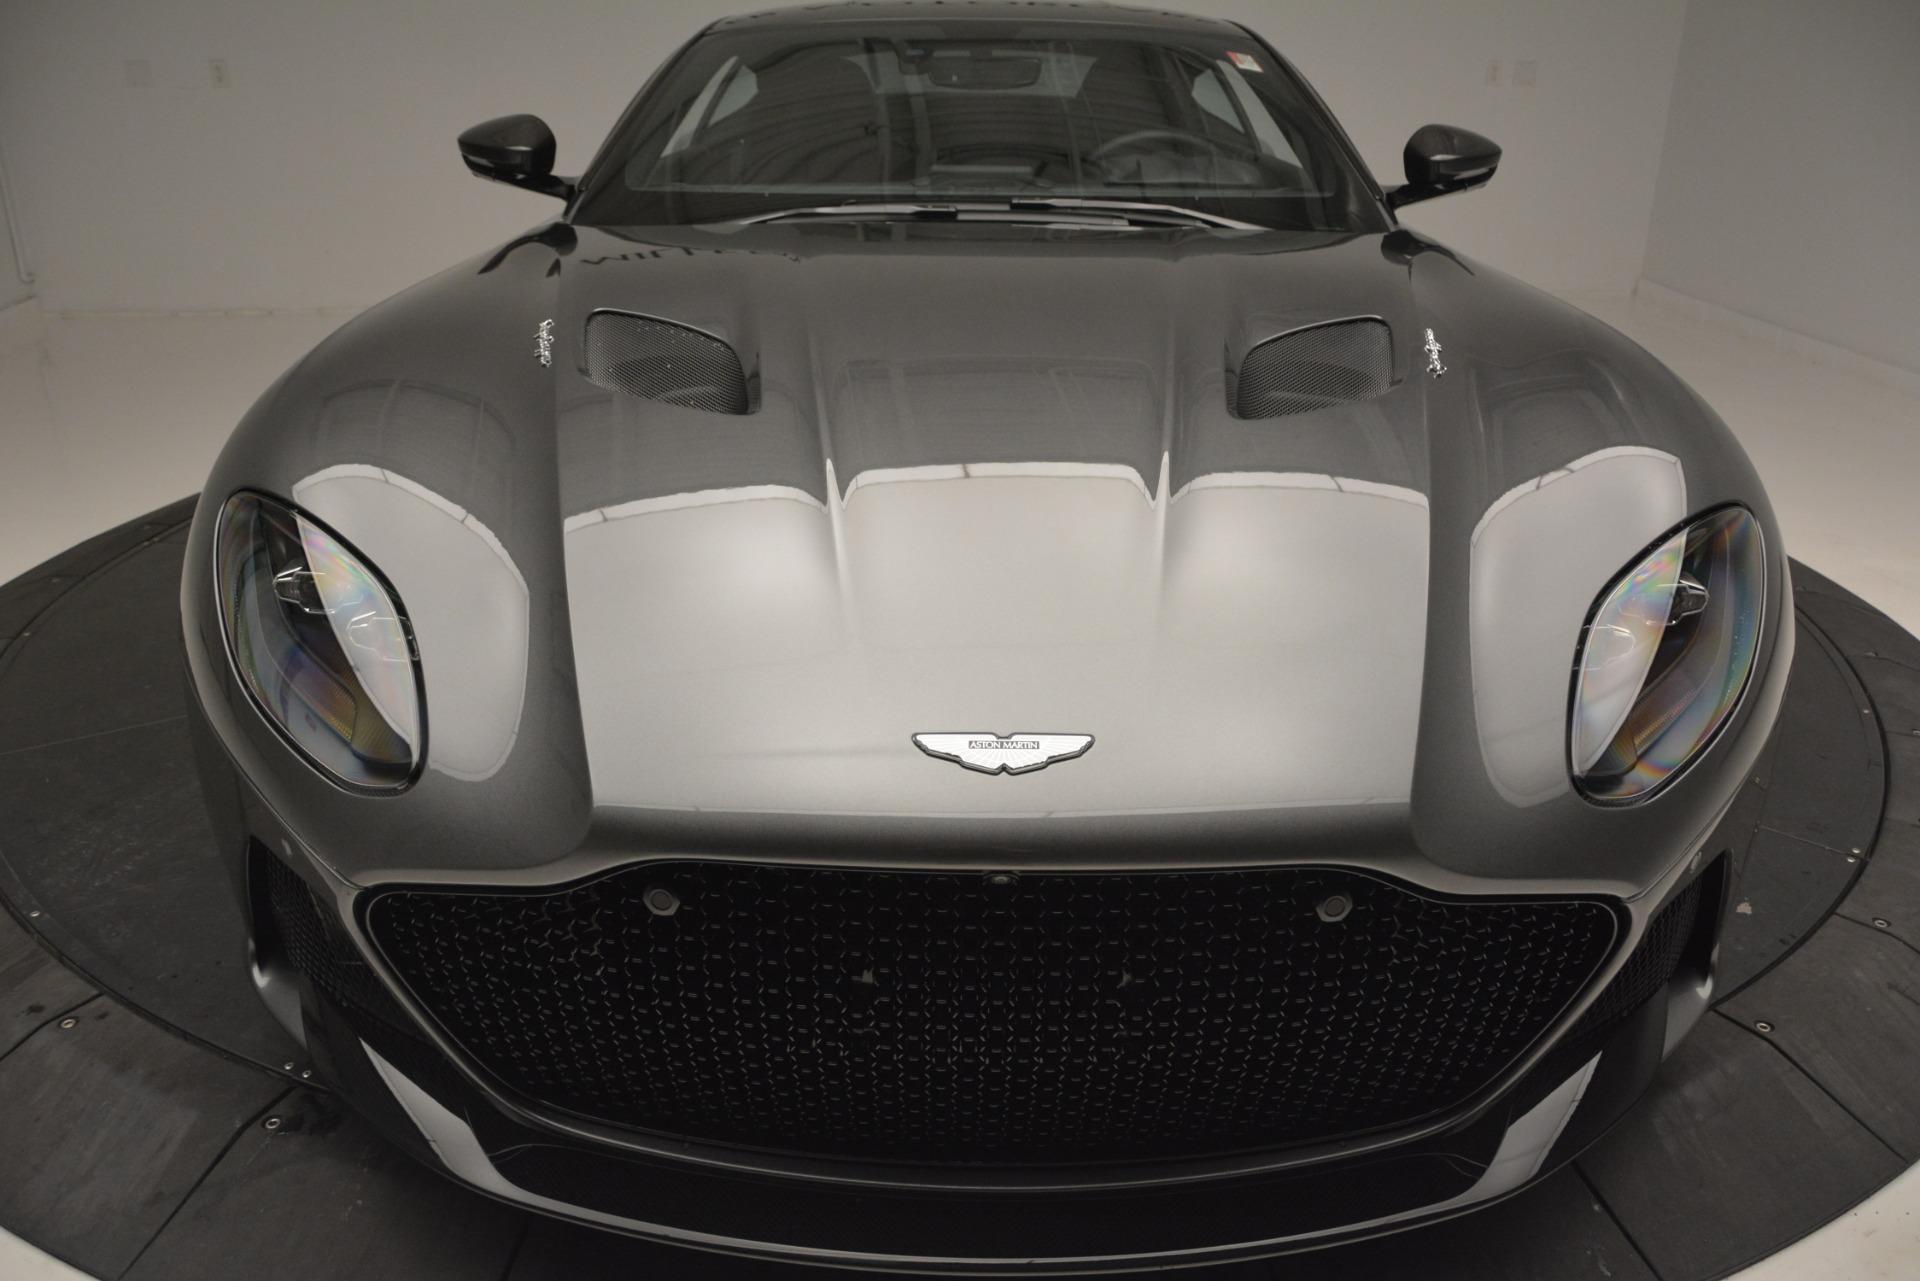 Used 2019 Aston Martin DBS Superleggera Coupe For Sale In Greenwich, CT 2917_p25